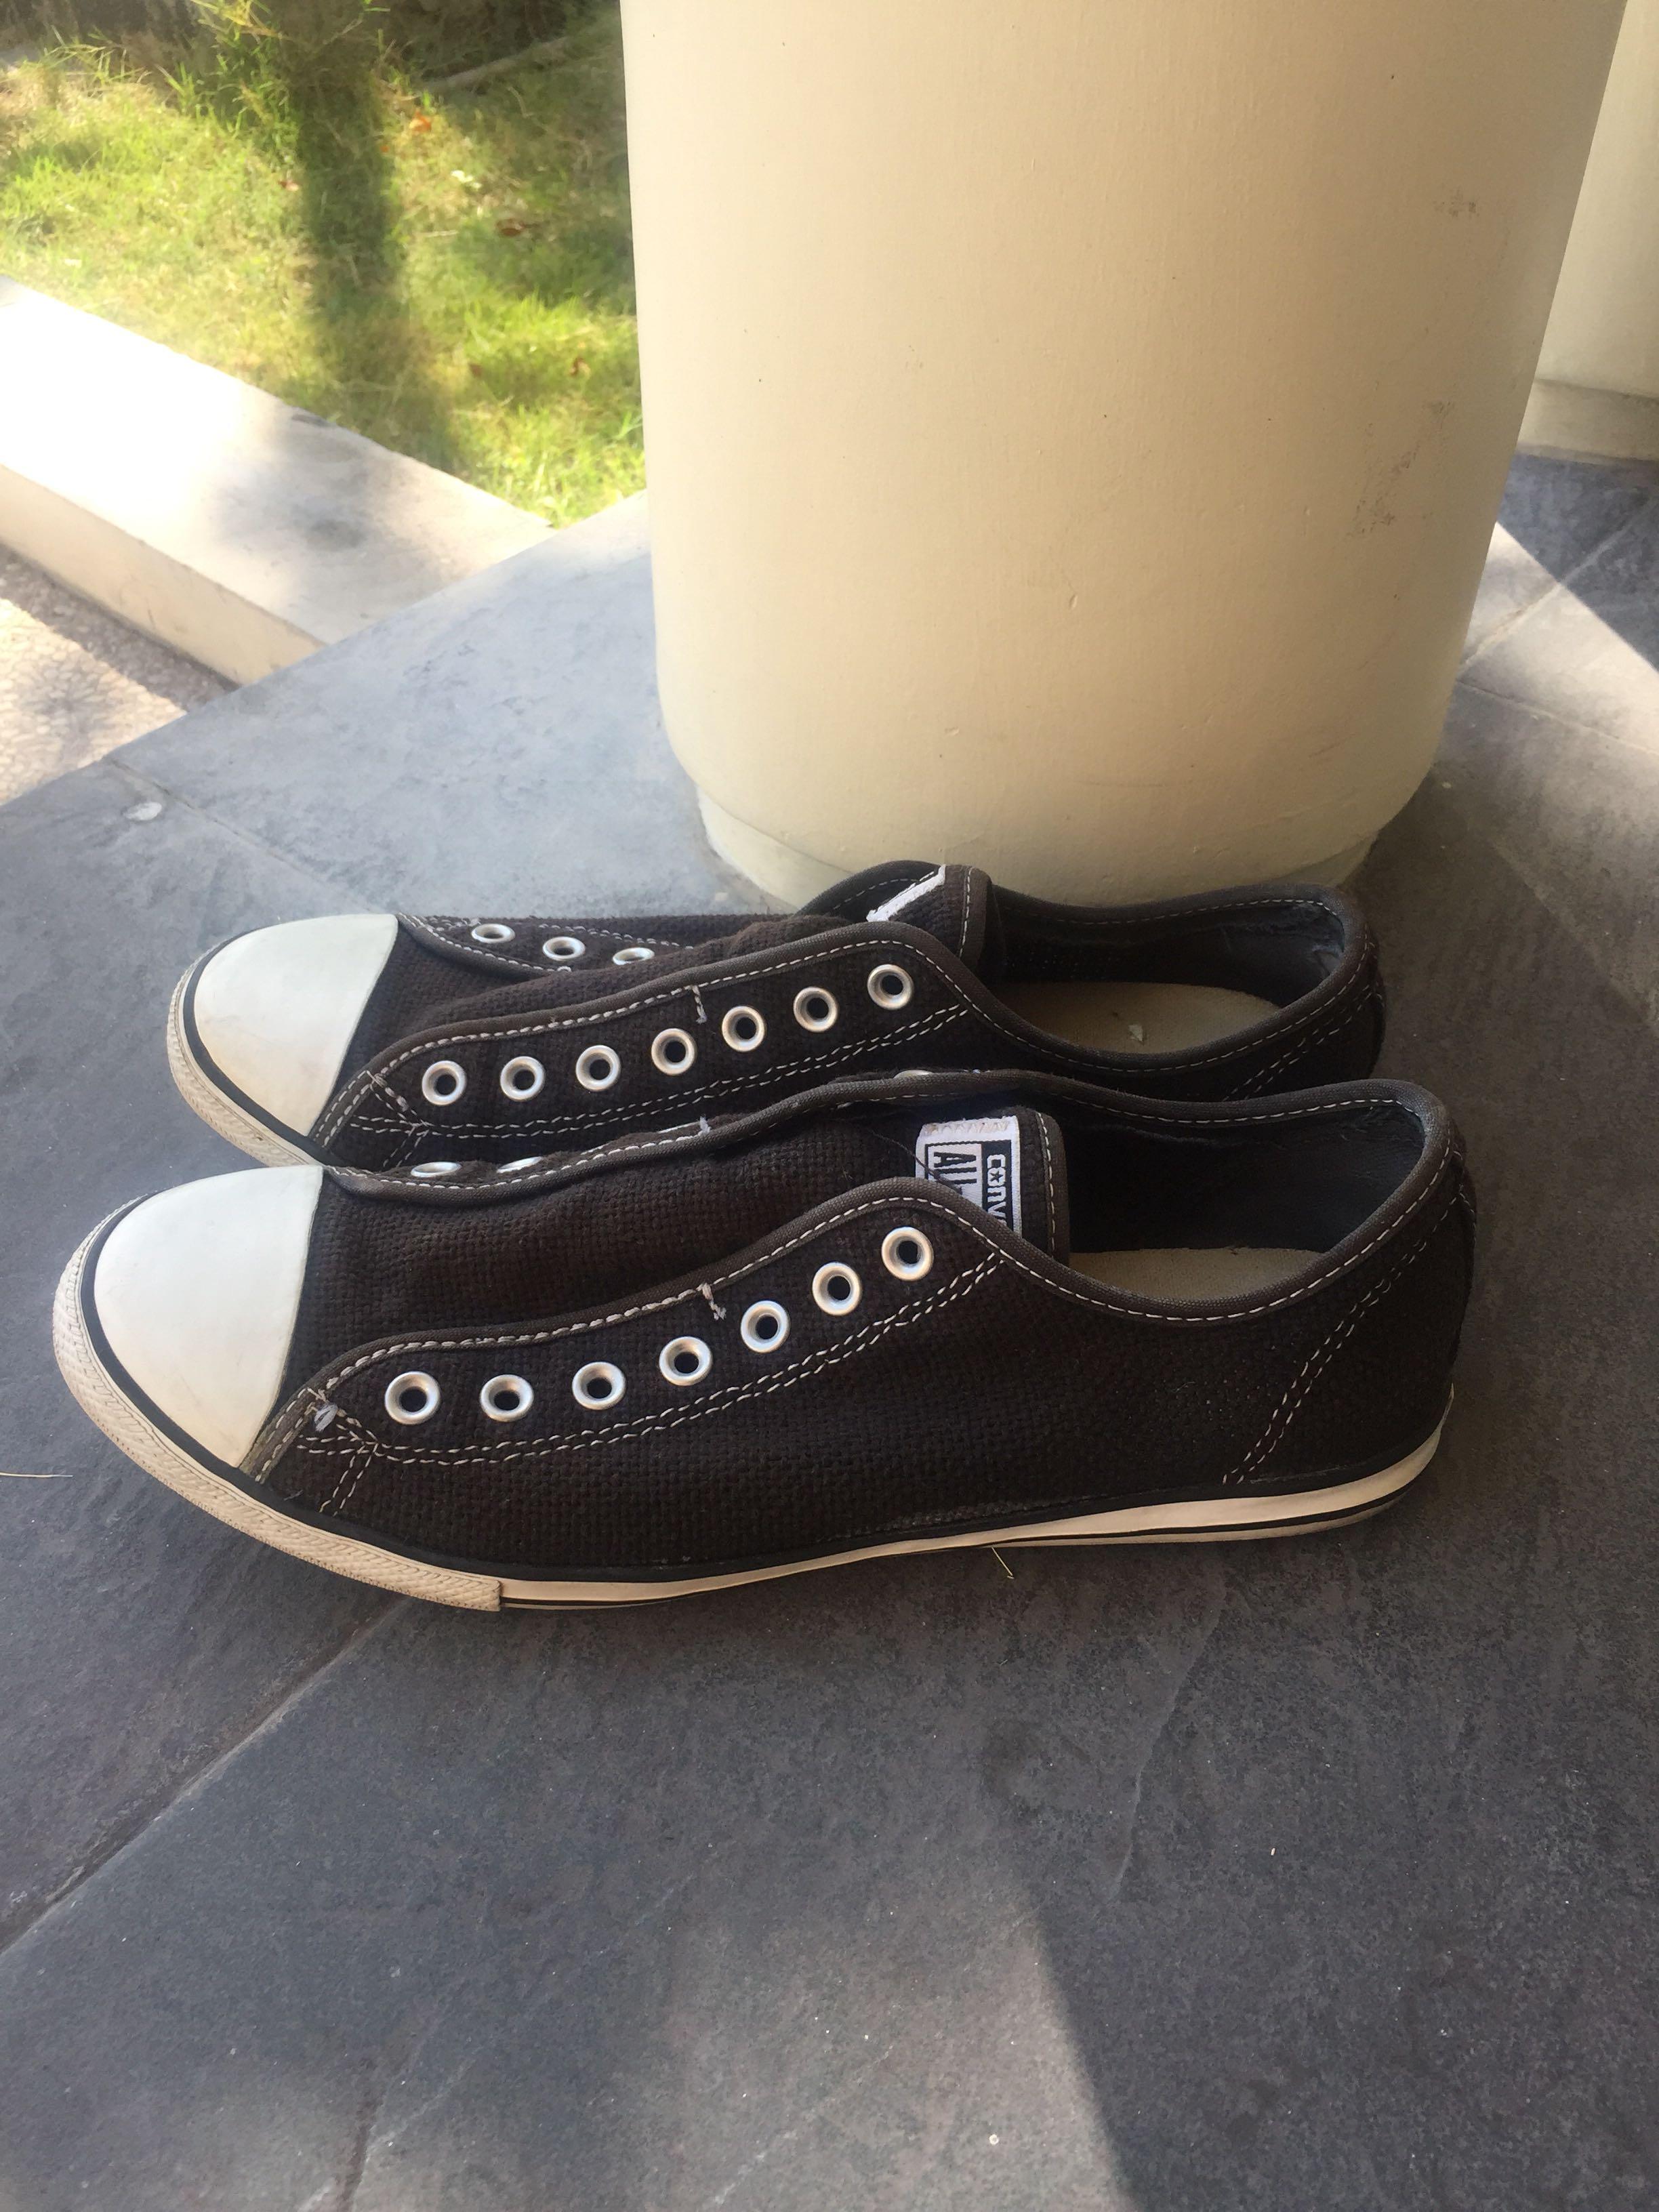 Sneaker Converse Black Preloved Fesyen Pria Sepatu Di Carousell